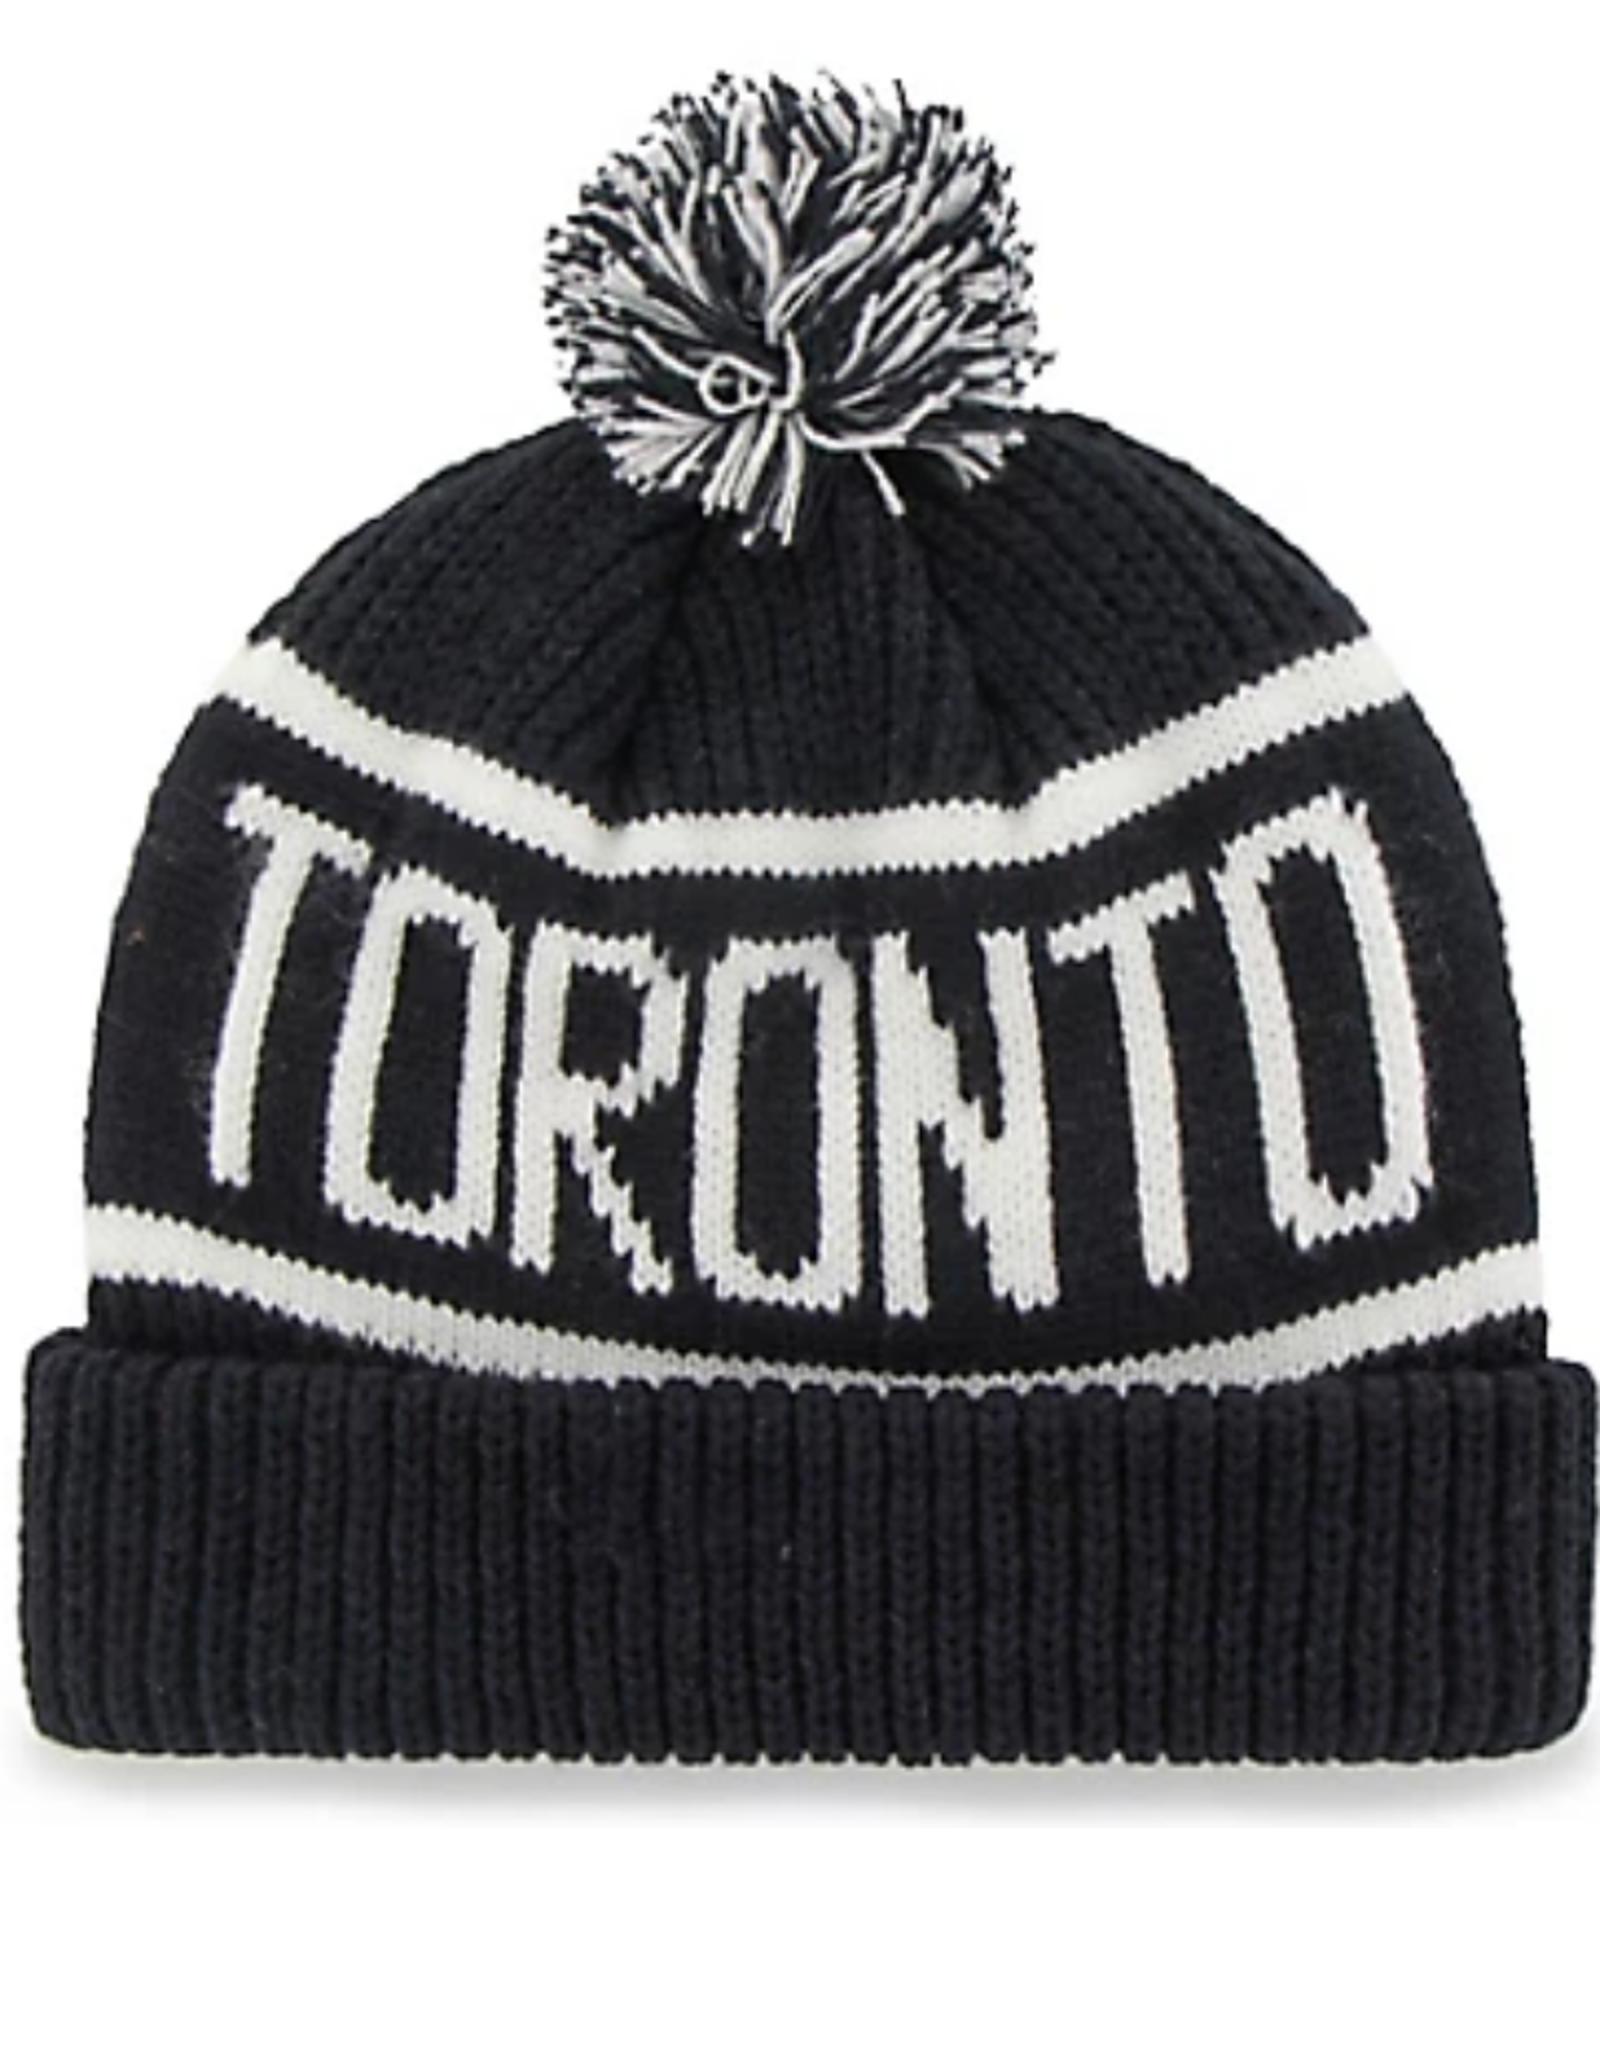 '47 Adult Calgary Cuff Knit Toronto Maple Leafs Navy